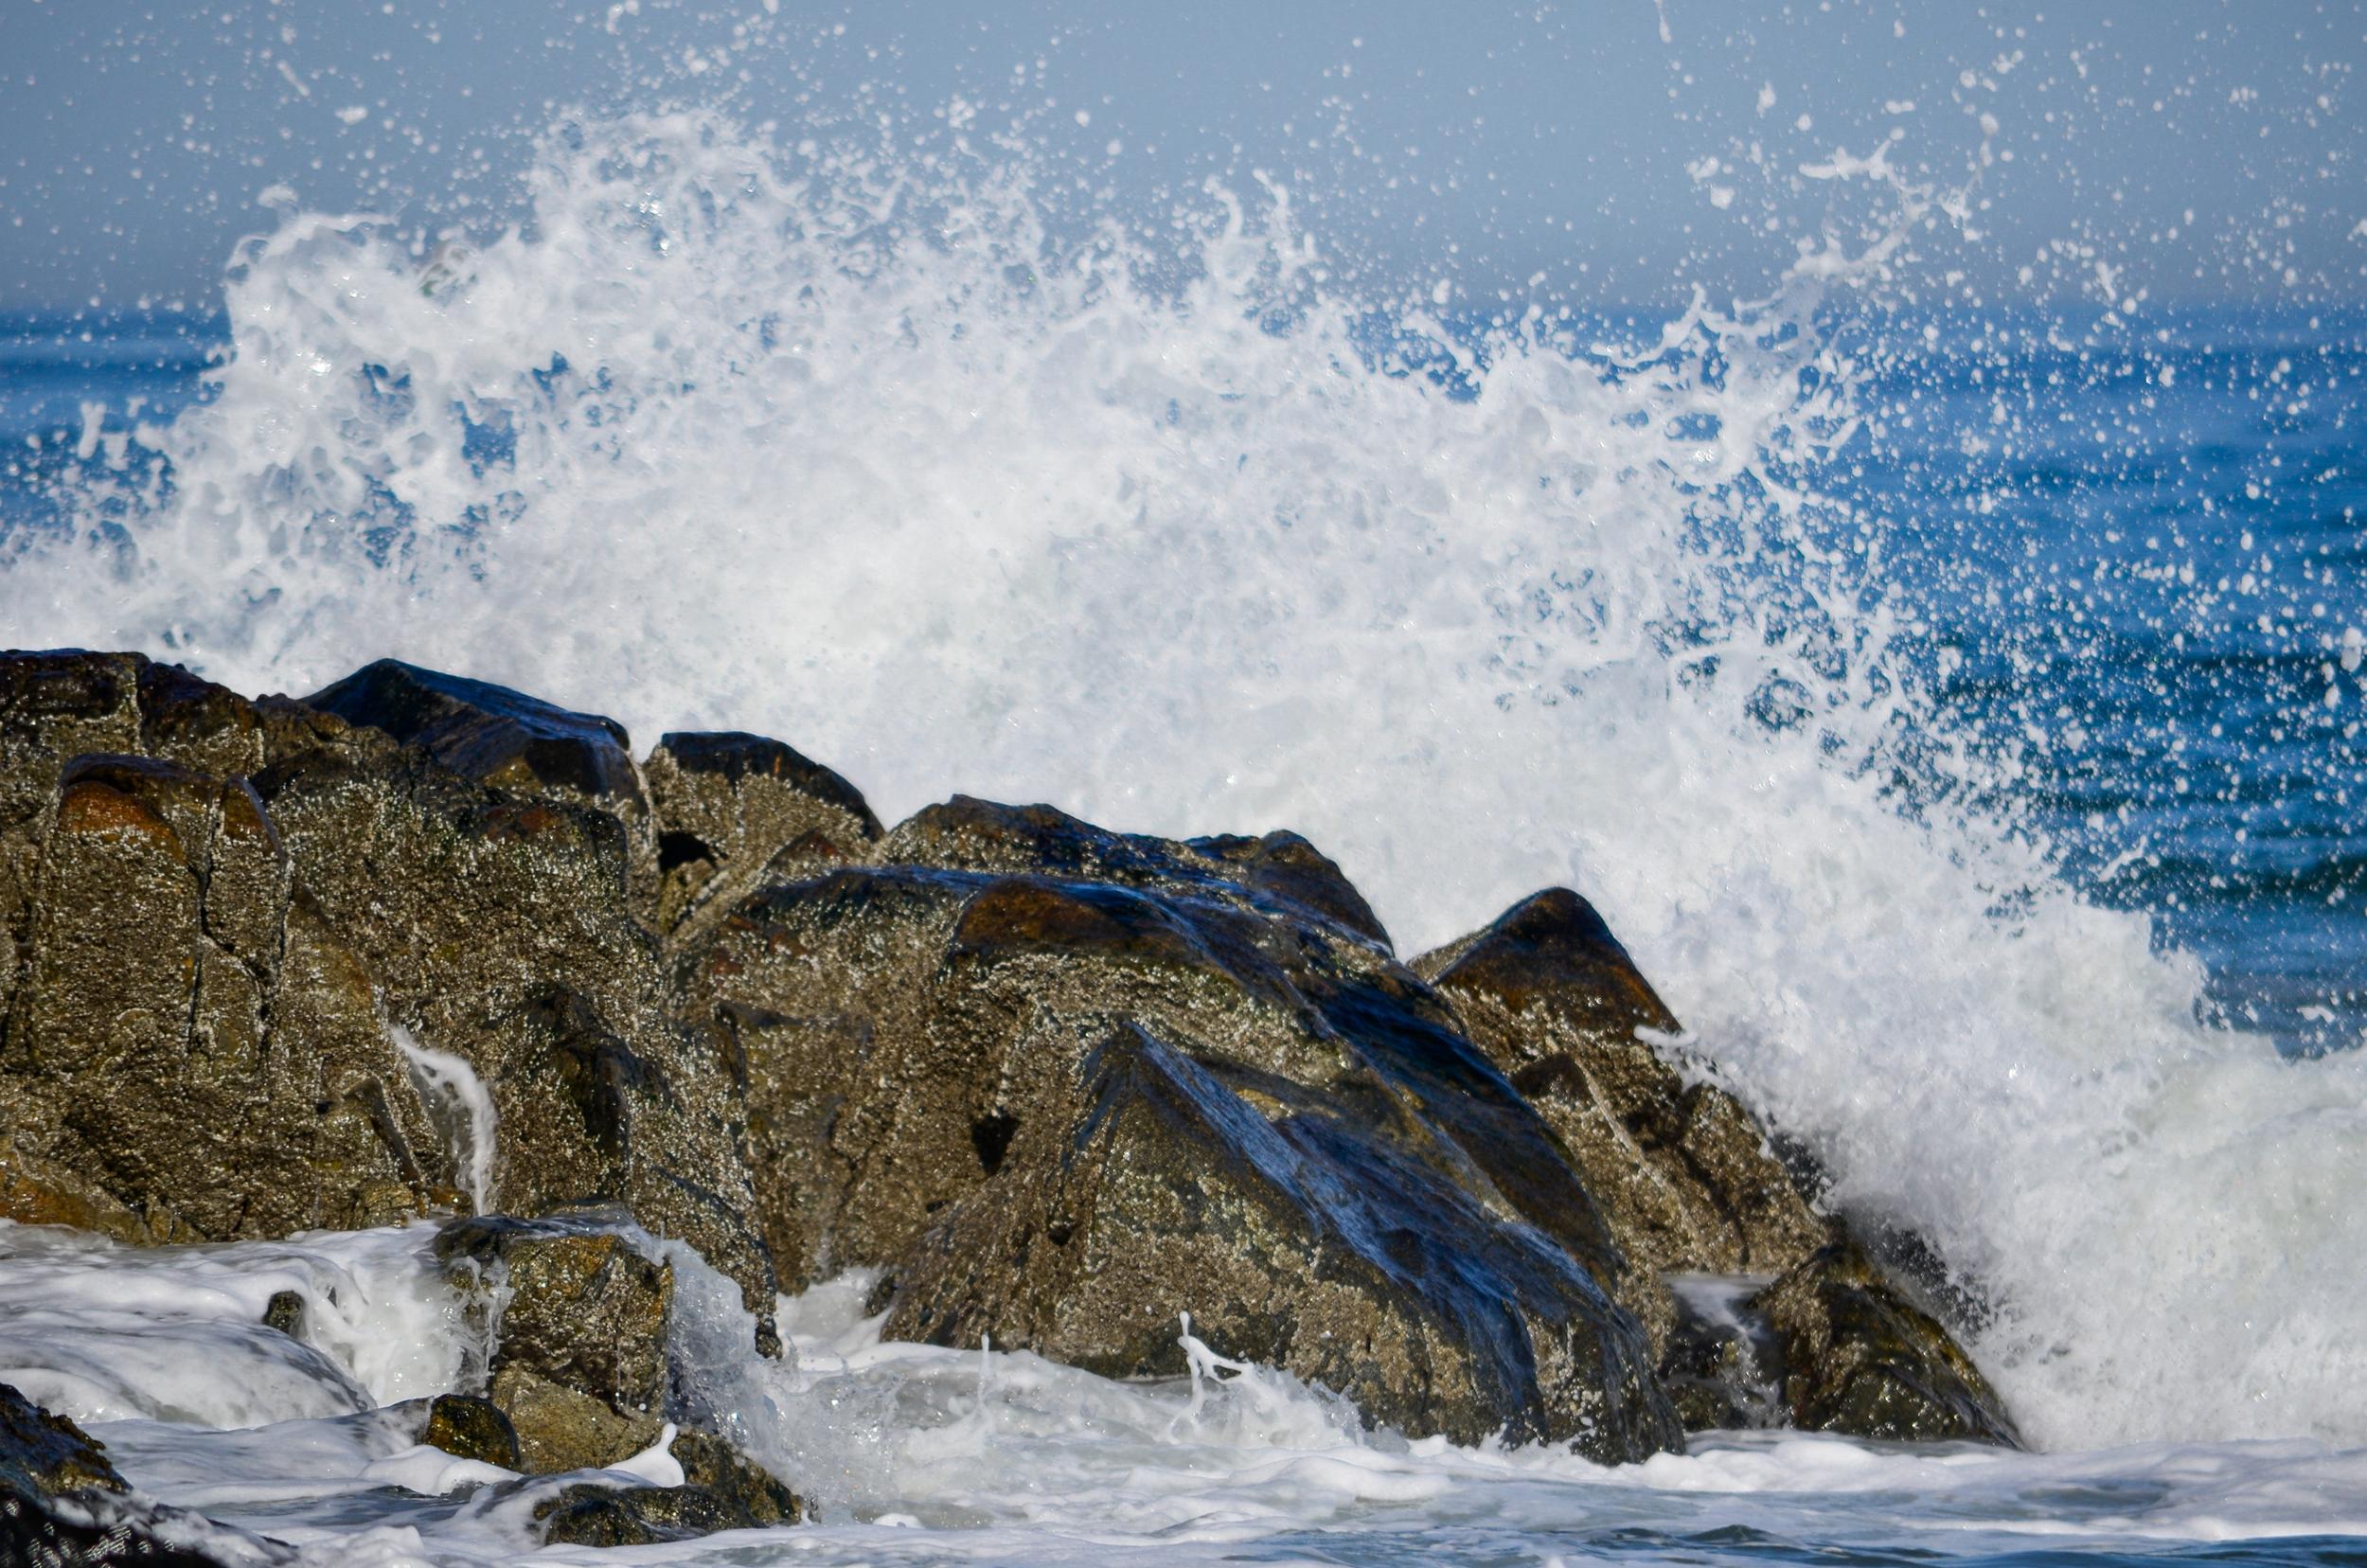 Beaches--Salisbury, Seabrook 2014-03-08 106.jpg